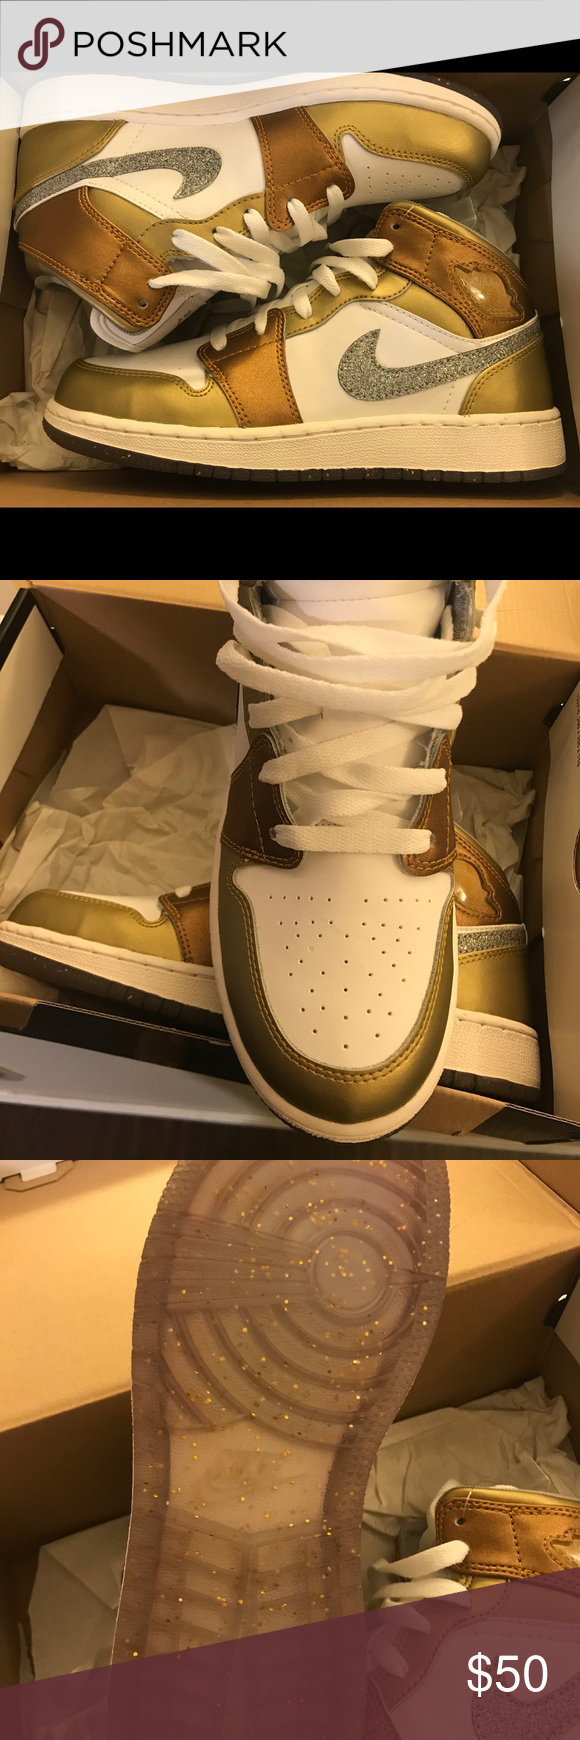 497ff8d9053 Girls Nike Air Jordan s Brand new in box